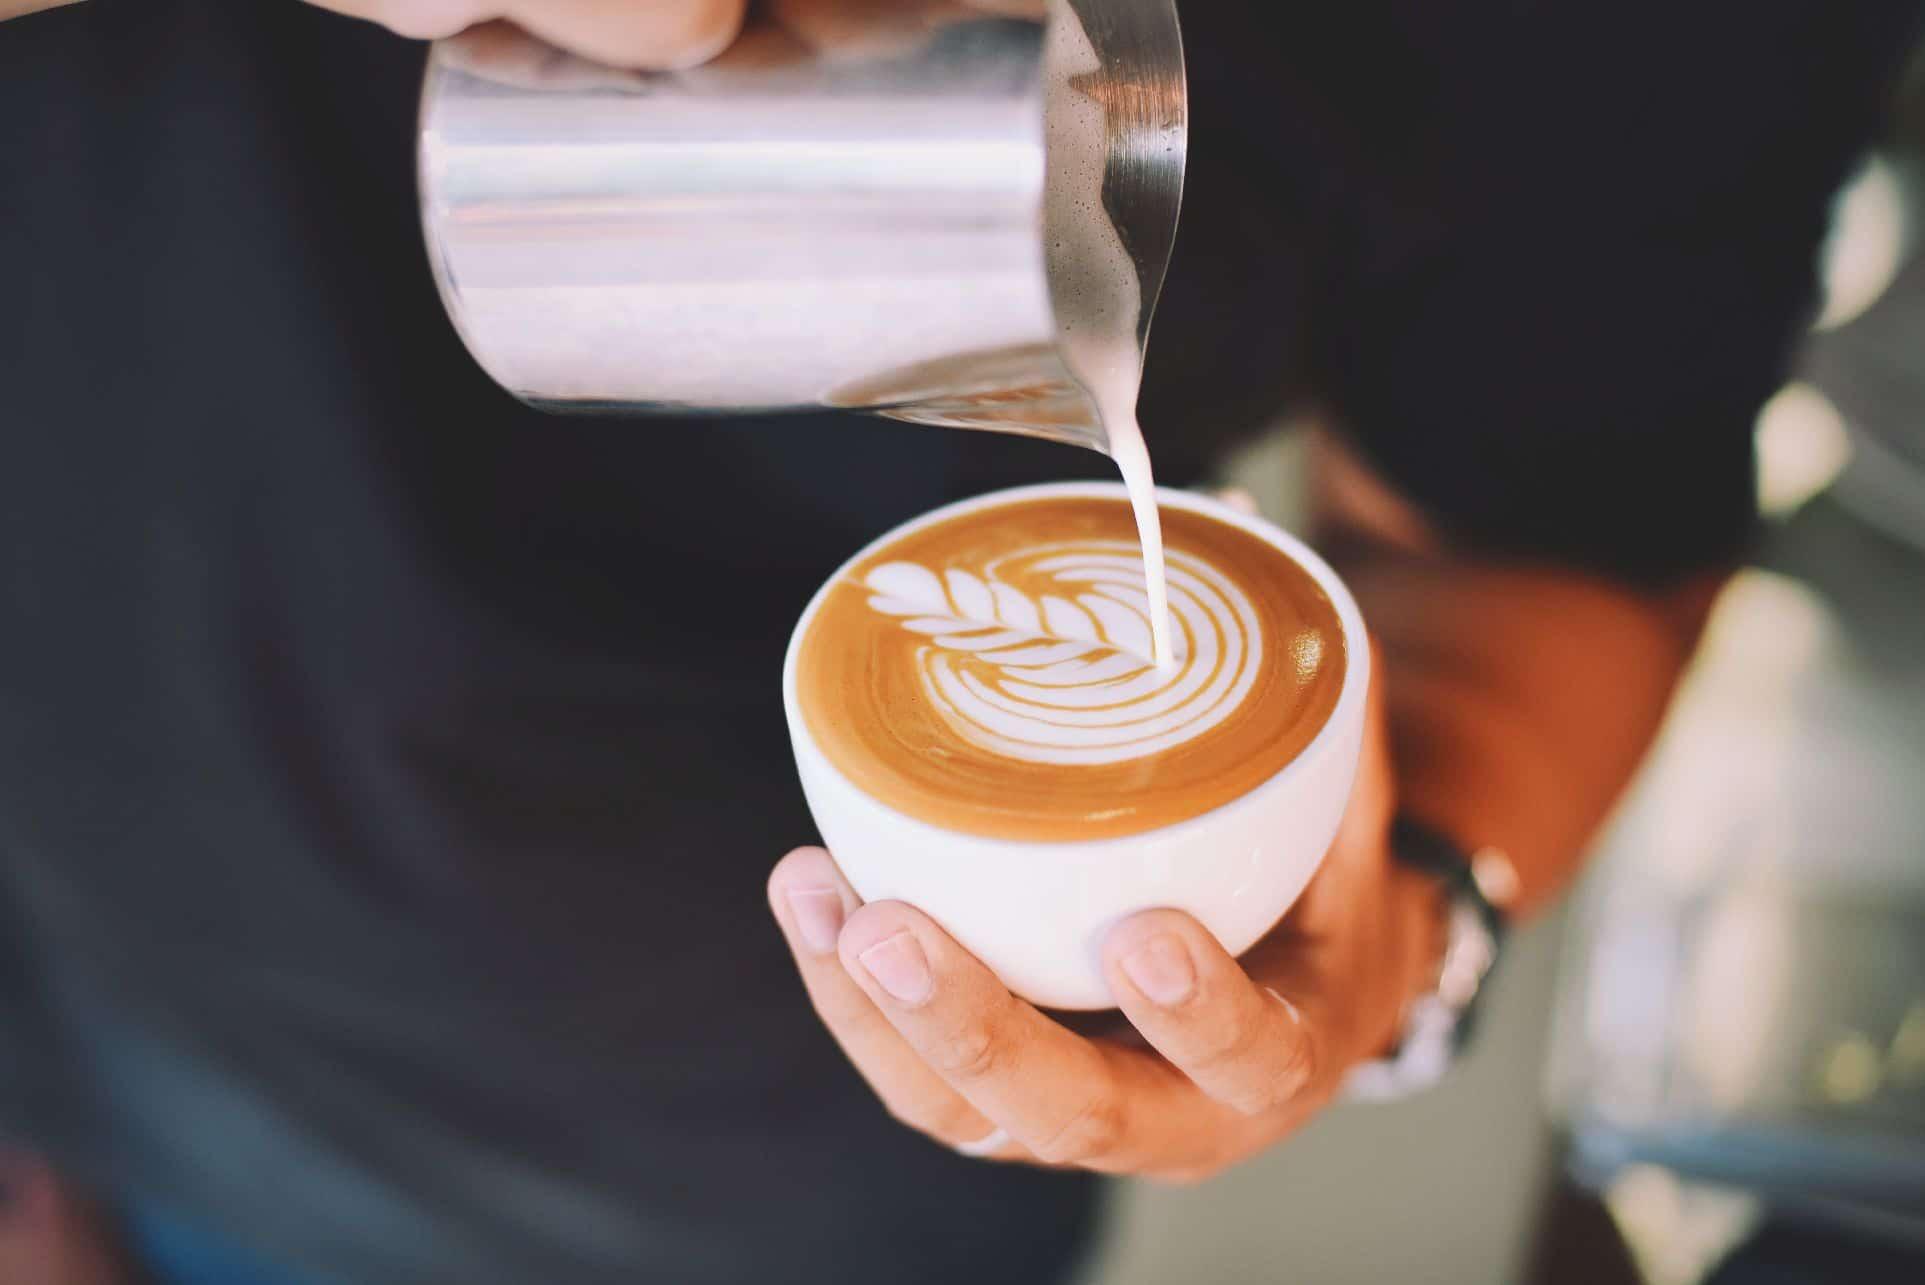 Kaffee, Capuccino